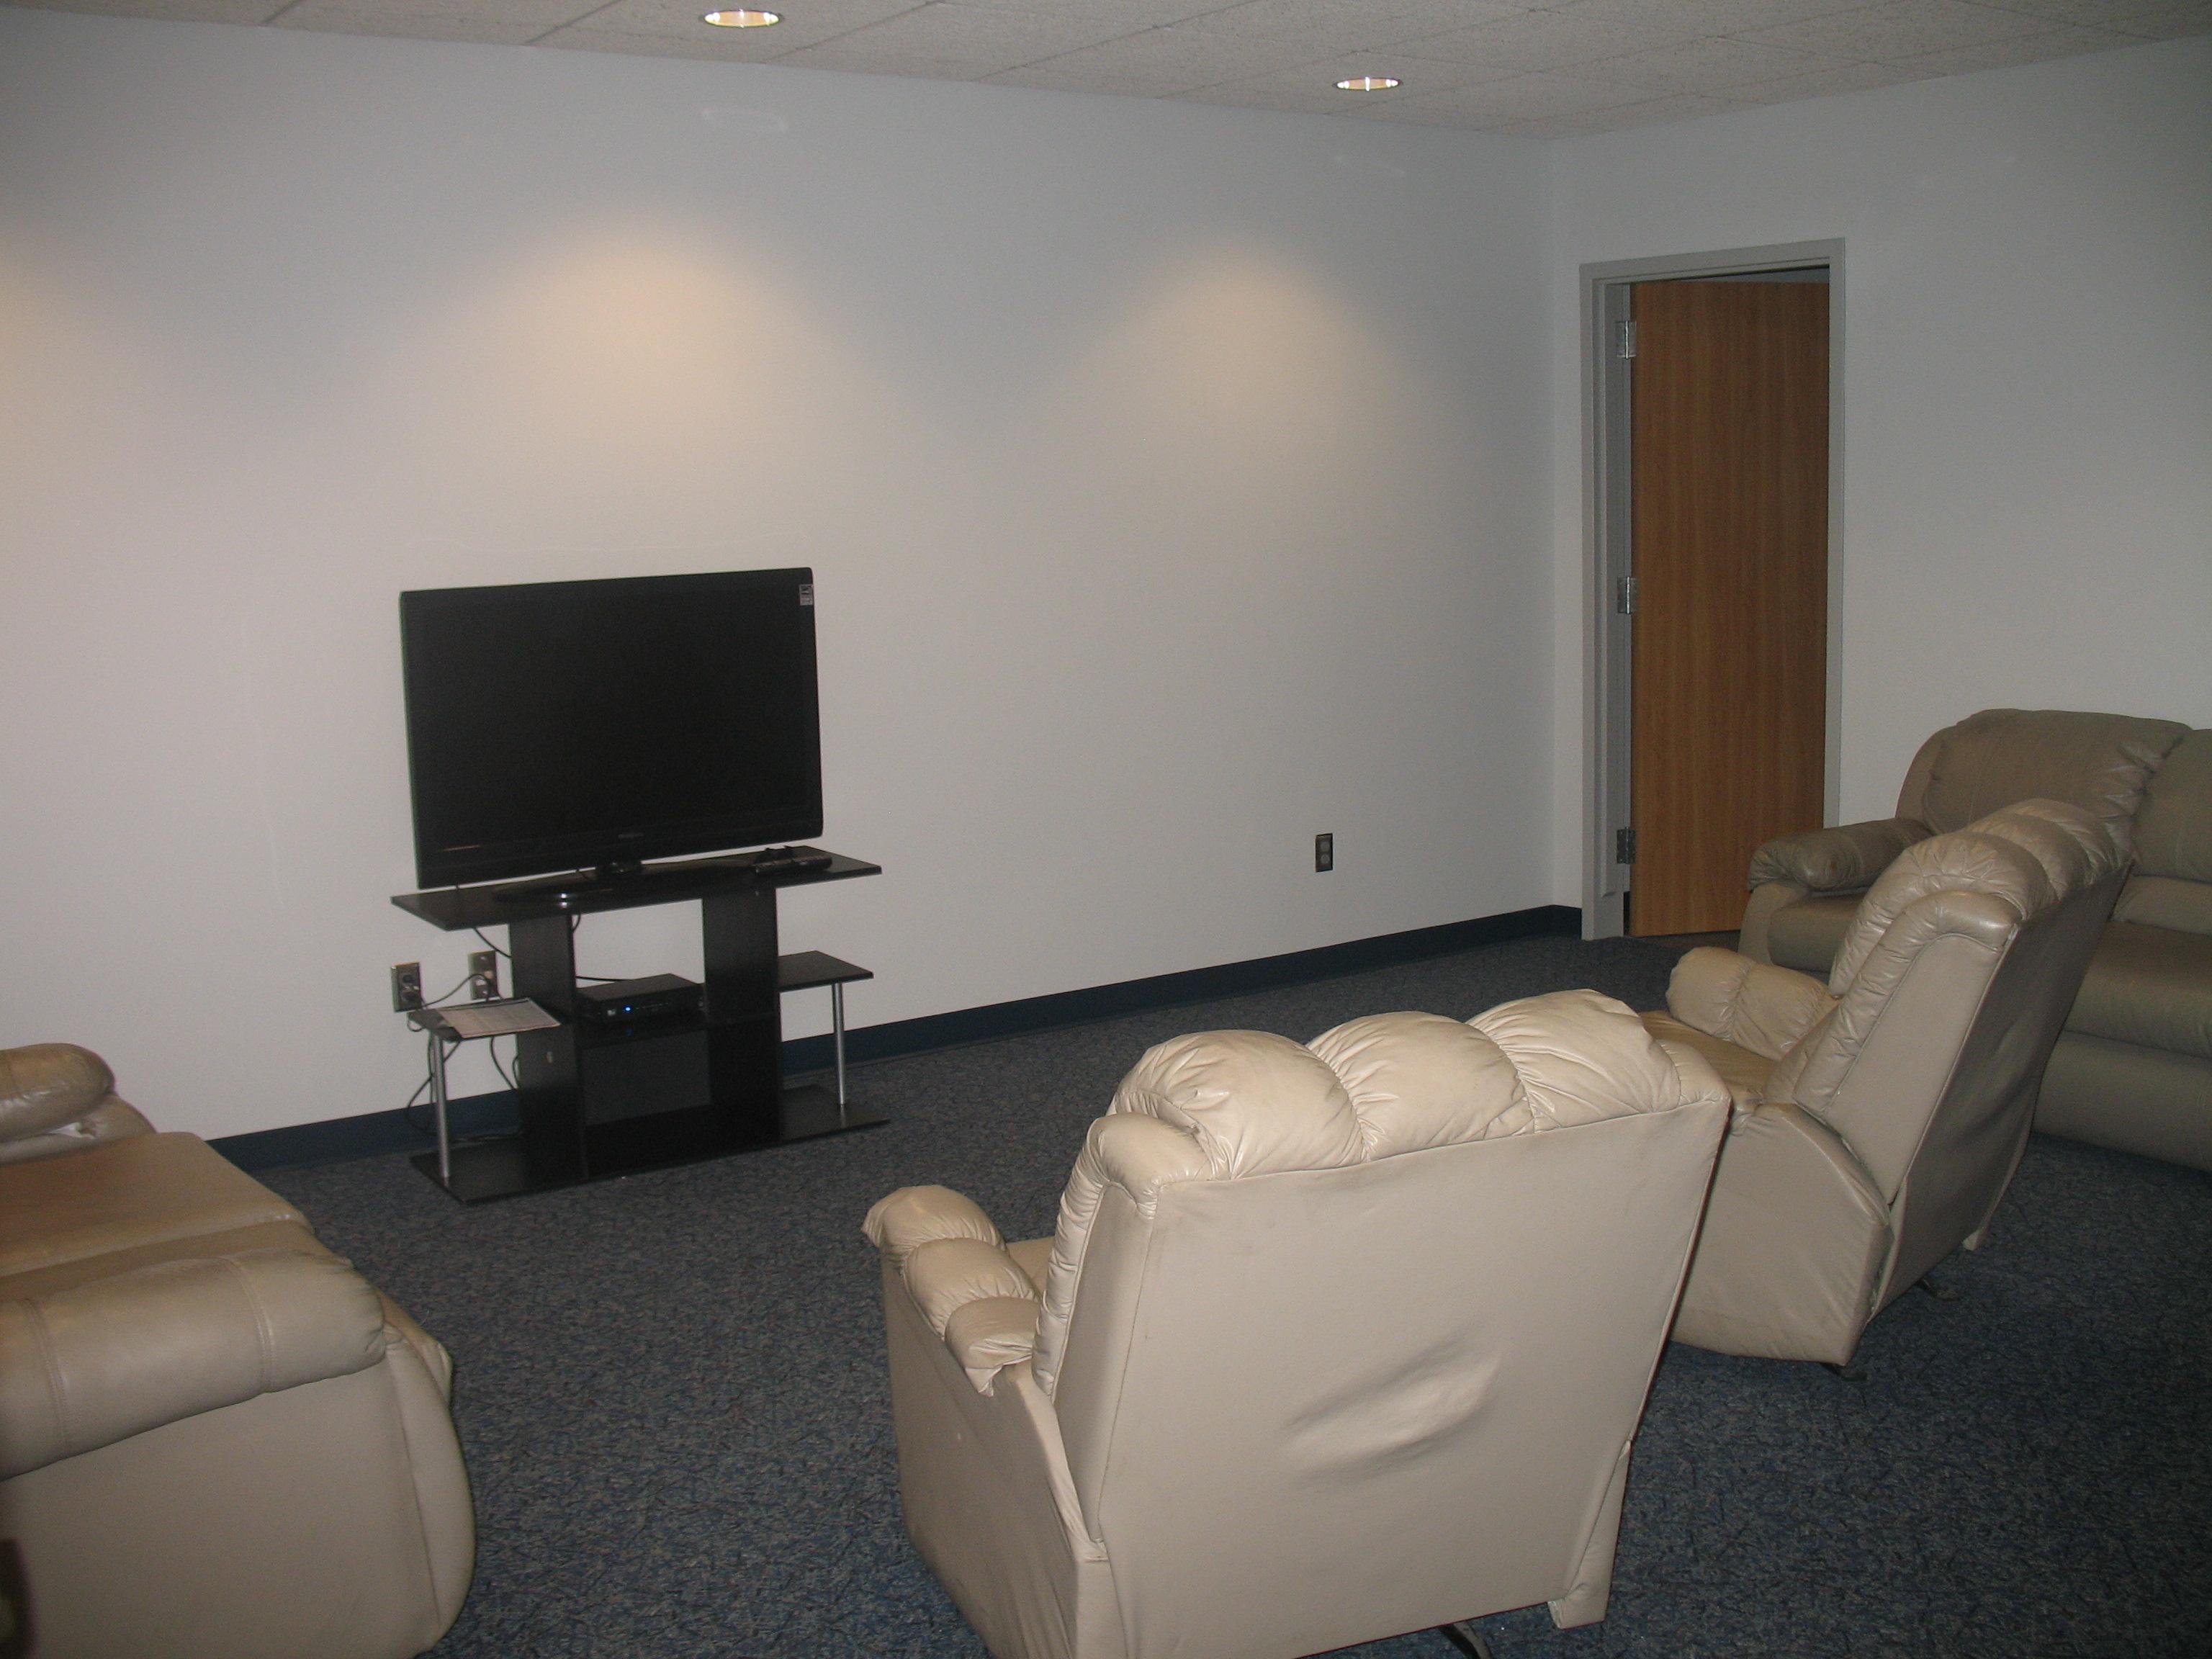 council-bluffs-airport-terminal-lounge